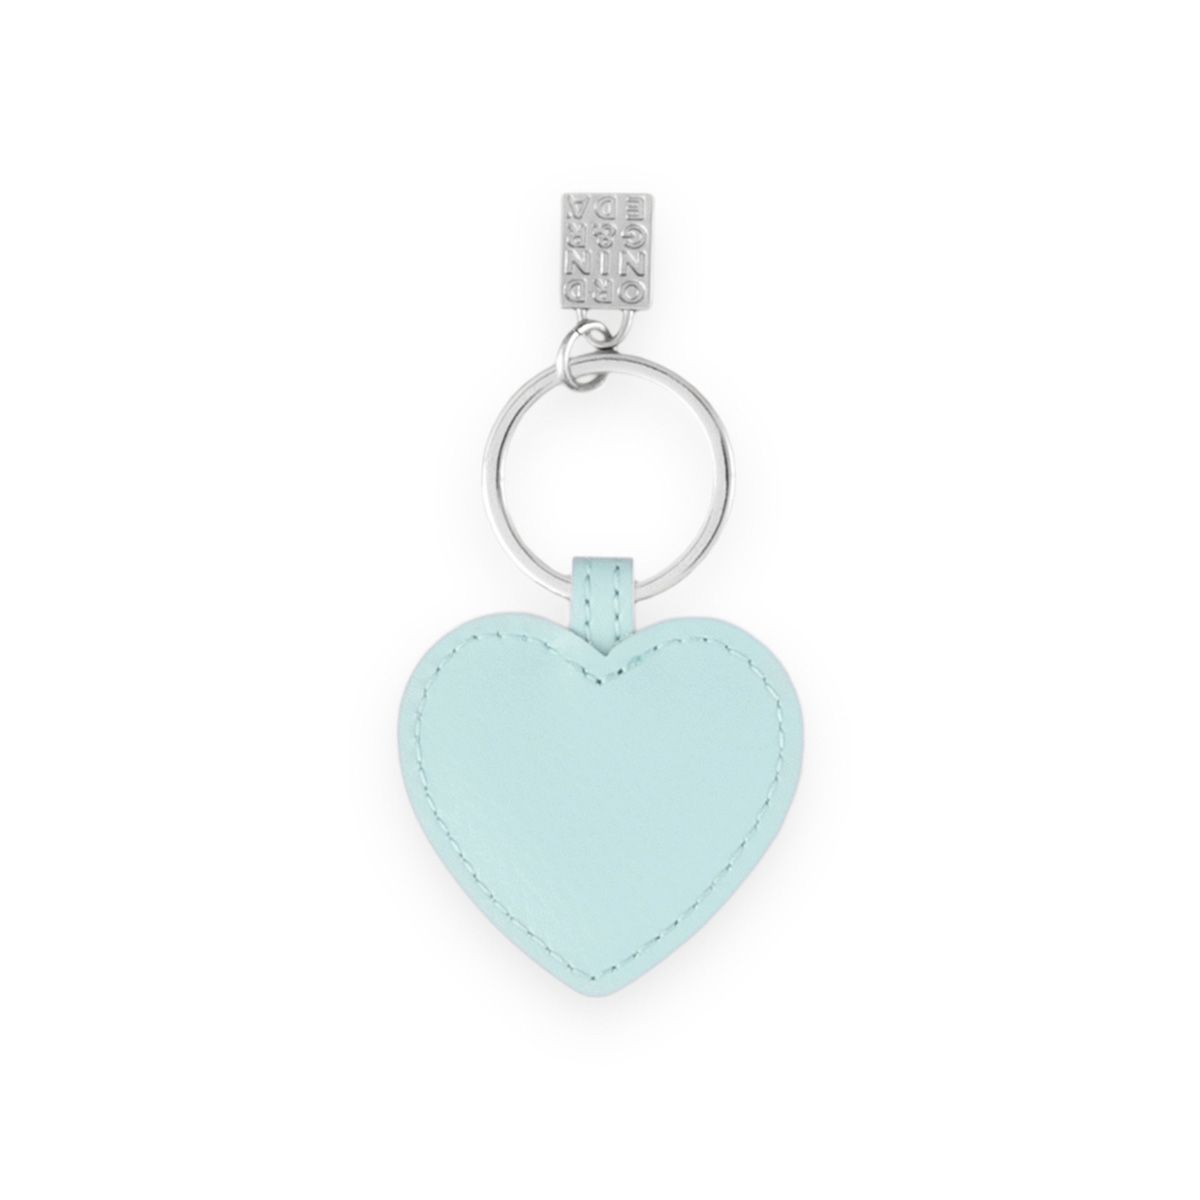 Key Ring HEART Ordning and Reda